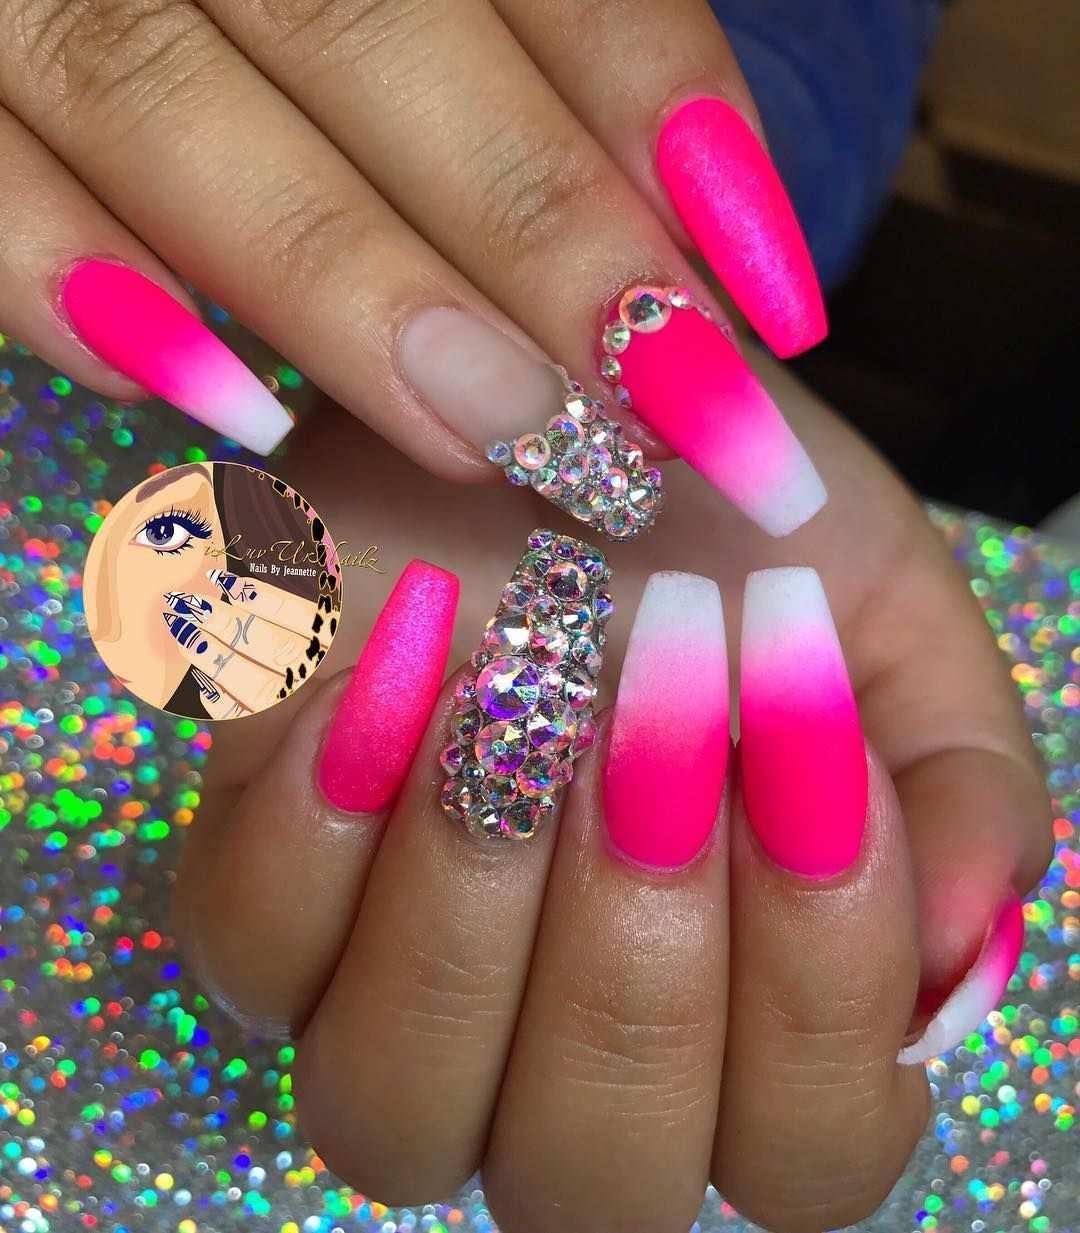 1 640 Likes 22 Comments J E A N N E T T E Iluvurnailz On Instagram Loving This Neon Pink Neon Yellow Pinke Nagel Gelbe Nagel Nageldesign Rosa